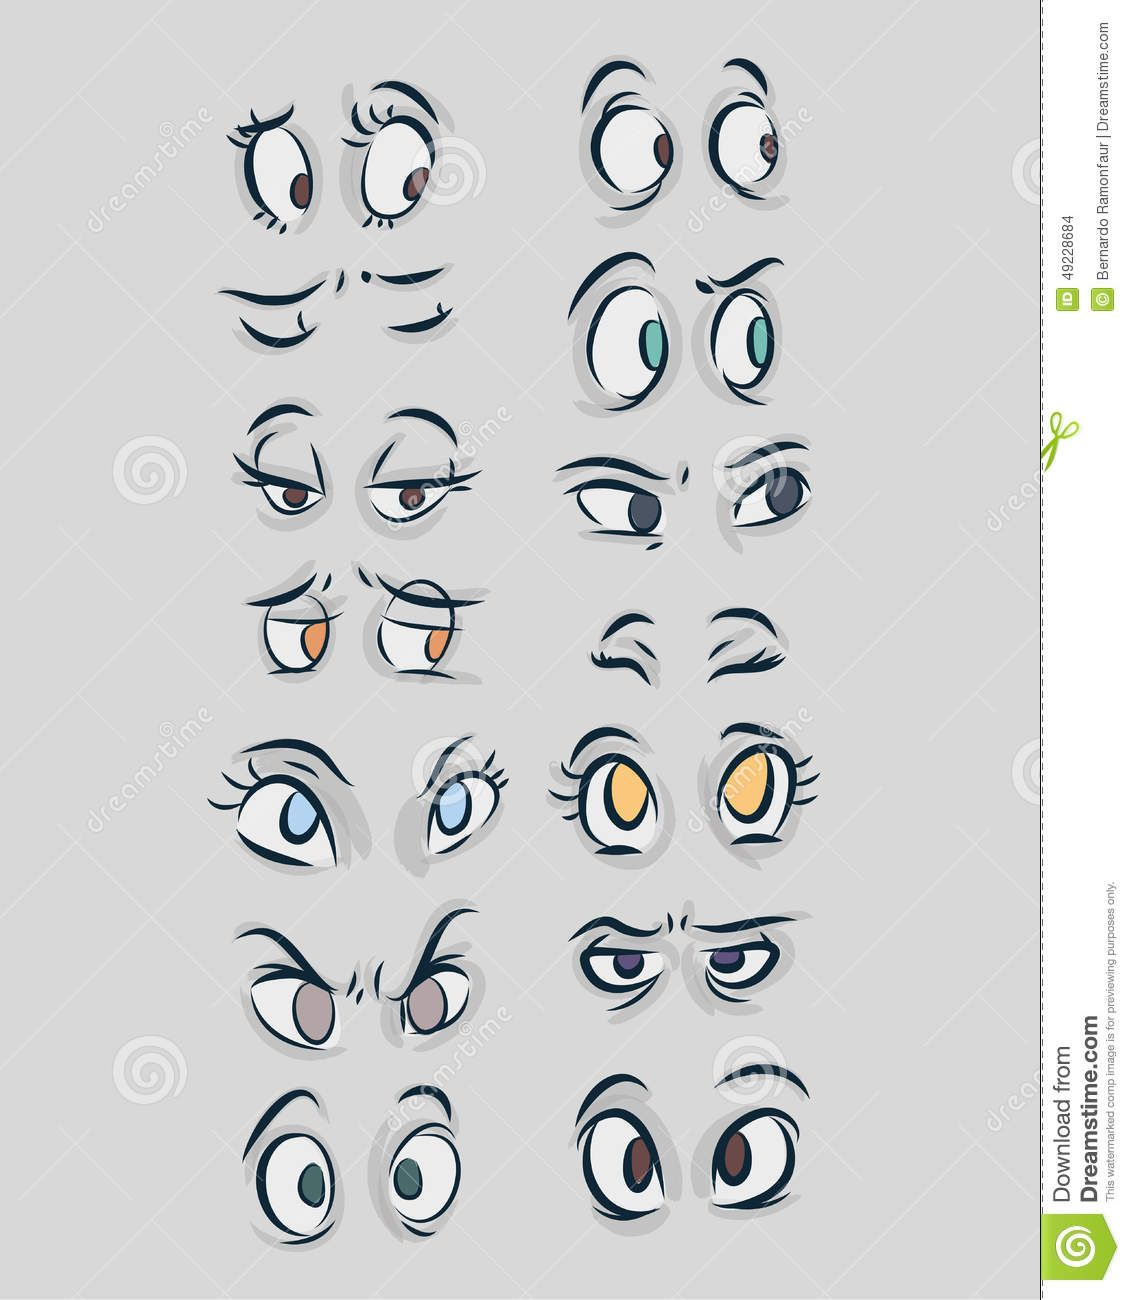 Eyes B Stock Illustration Cartoondealer Com 49228684 Cartoon Style Drawing Hand Drawn Vector Illustrations Cartoon Eyes Drawing